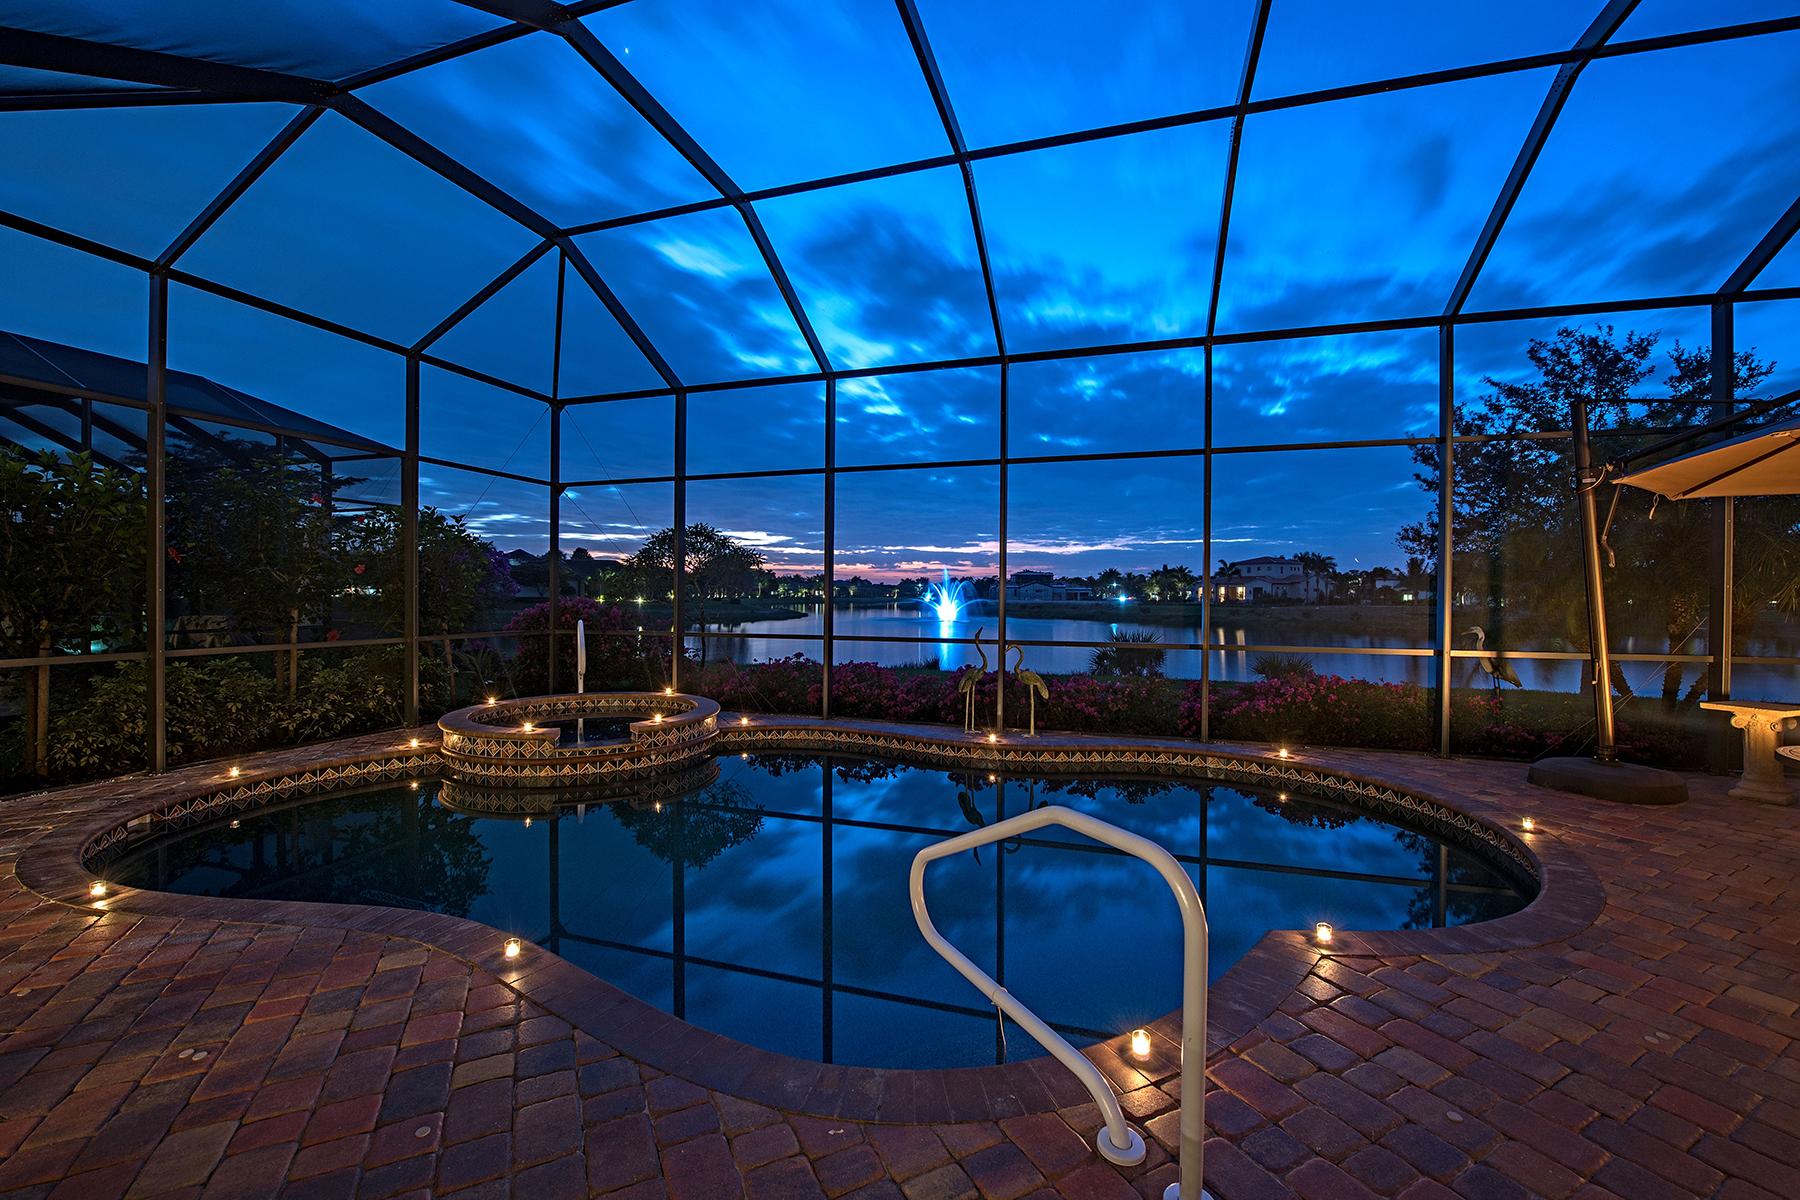 獨棟家庭住宅 為 出售 在 16725 Cabreo Dr , Naples, FL 34110 16725 Cabreo Dr Naples, 佛羅里達州, 34110 美國